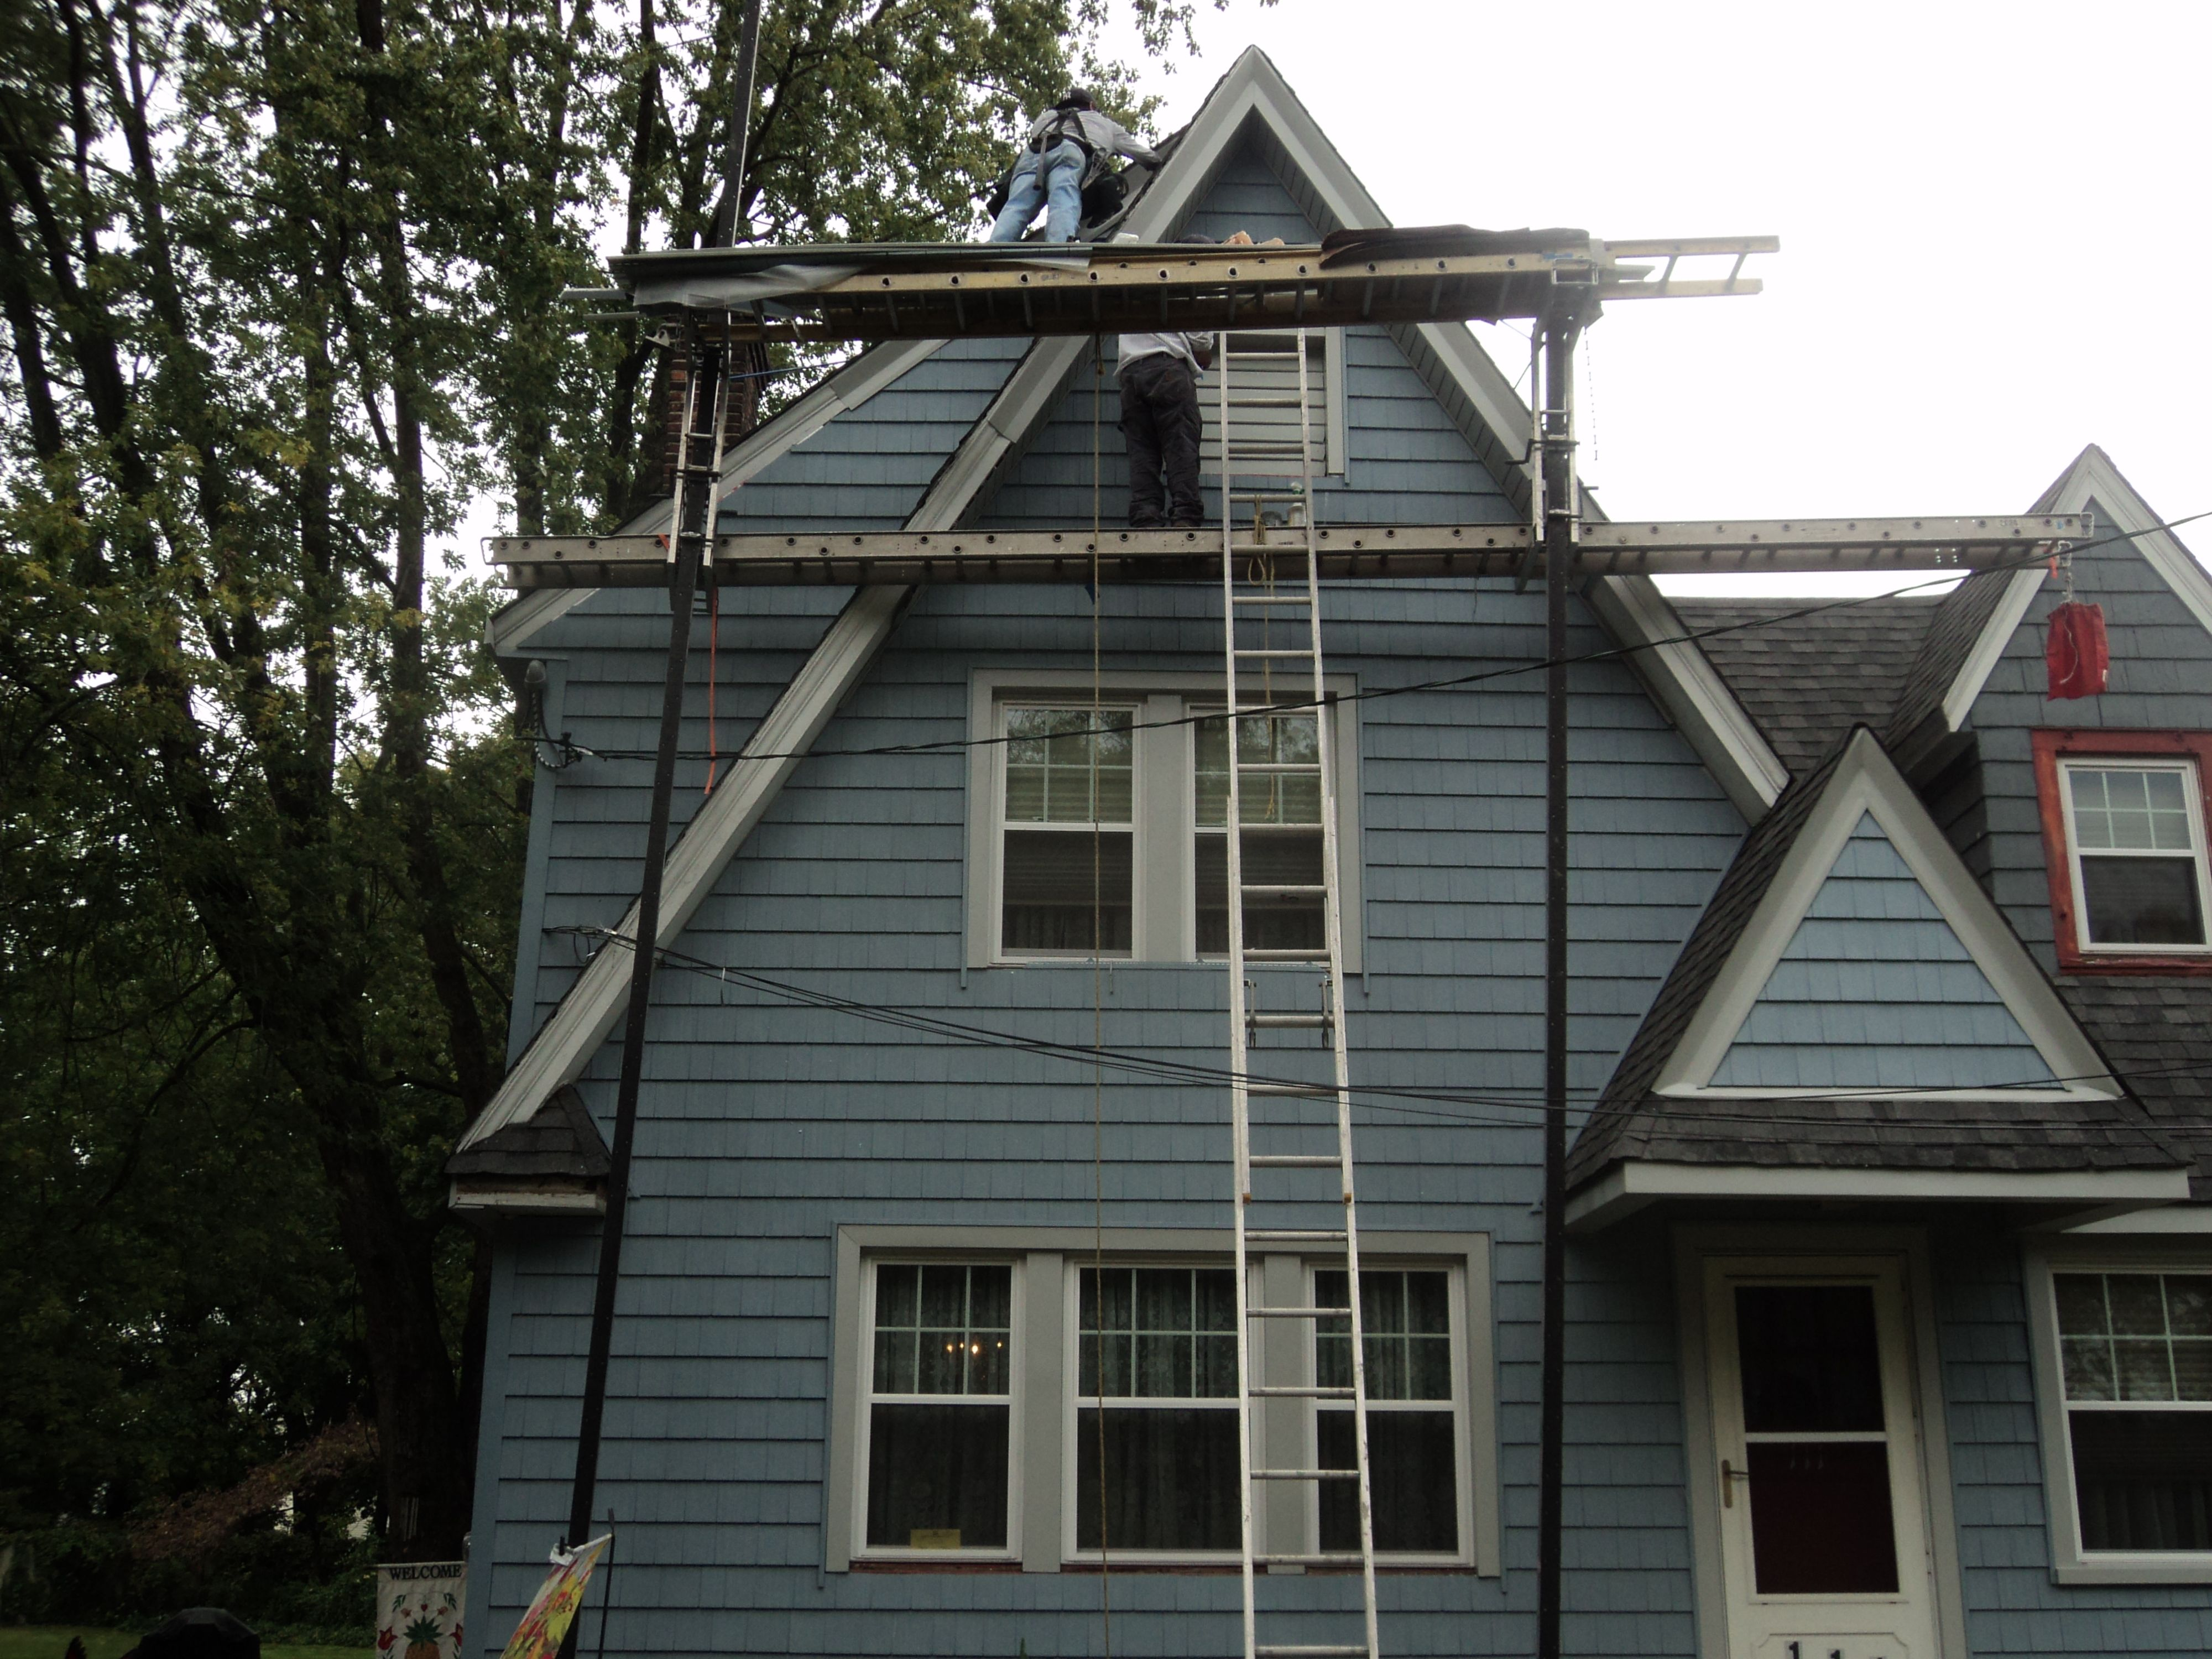 Why Edgewater Nj Homes Prefer Affordable Vinyl Siding 973 487 3704 Vinyl Cedar Shake Siding House Siding Types House Siding